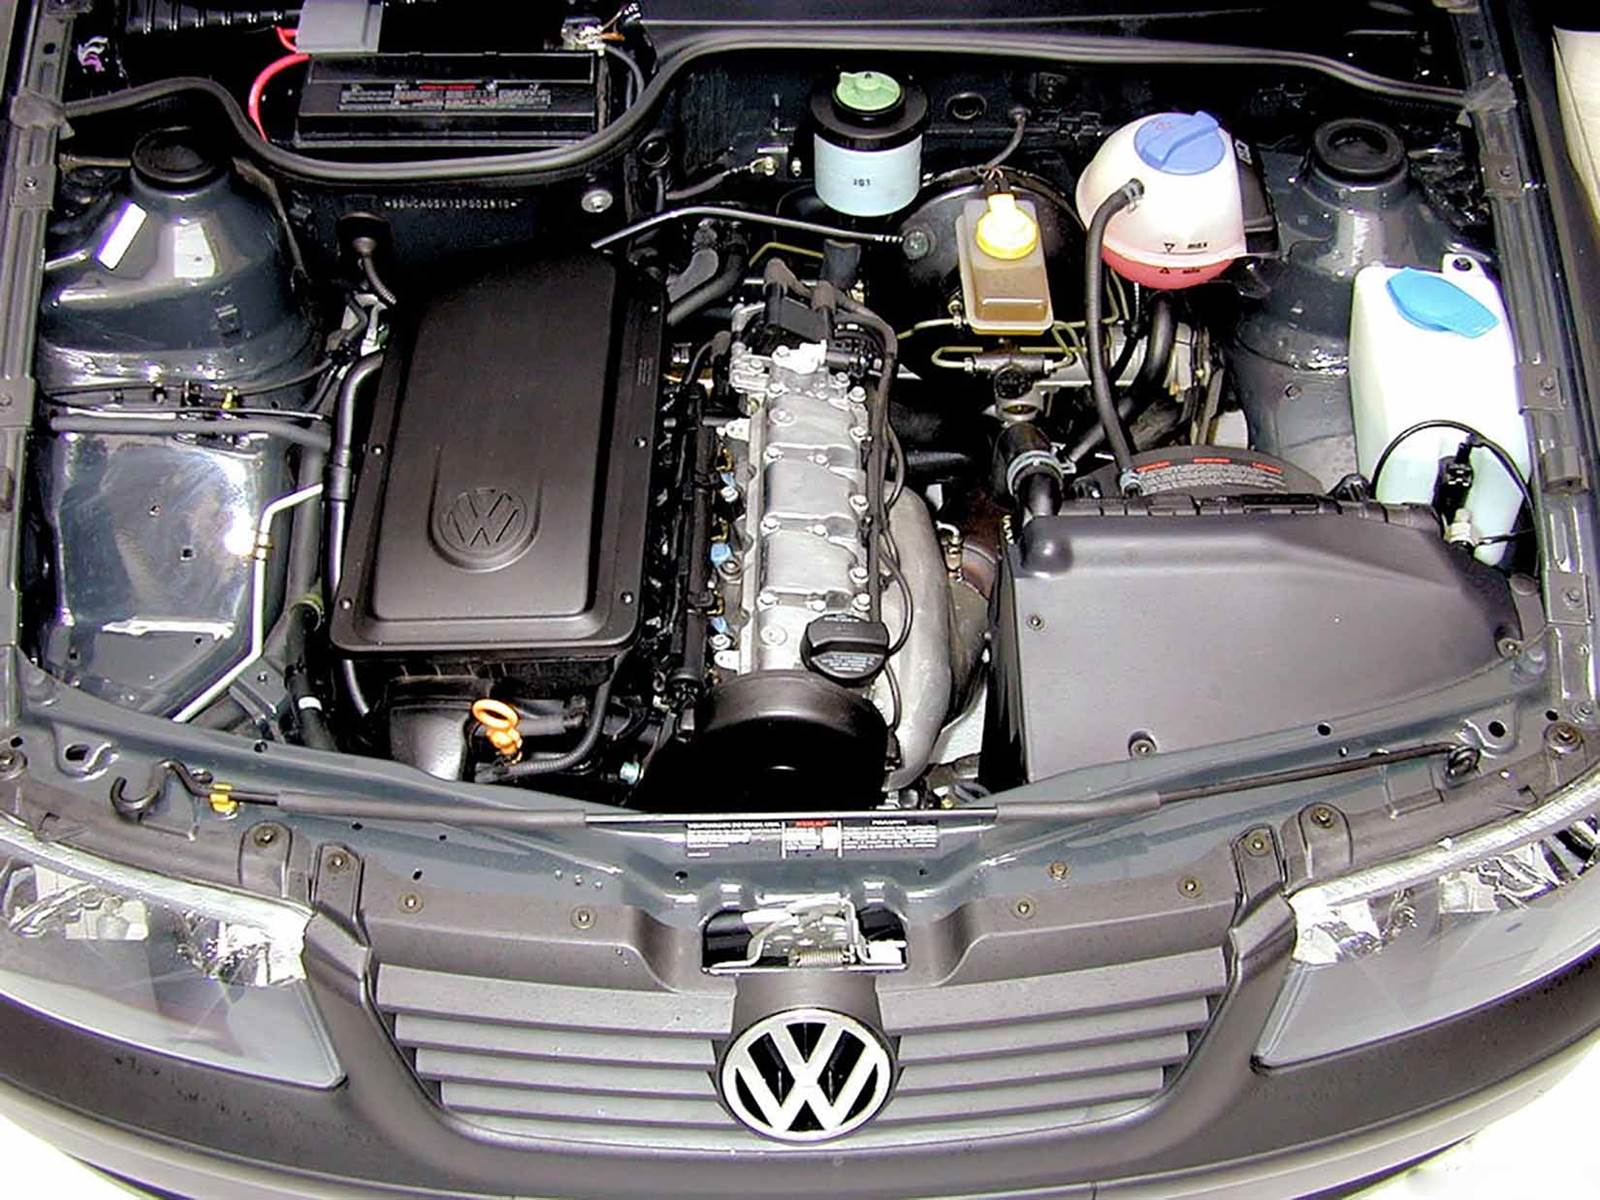 Filtro De Ar Esportivo Inbox VW Gol G3 1.0 2000 até 2005